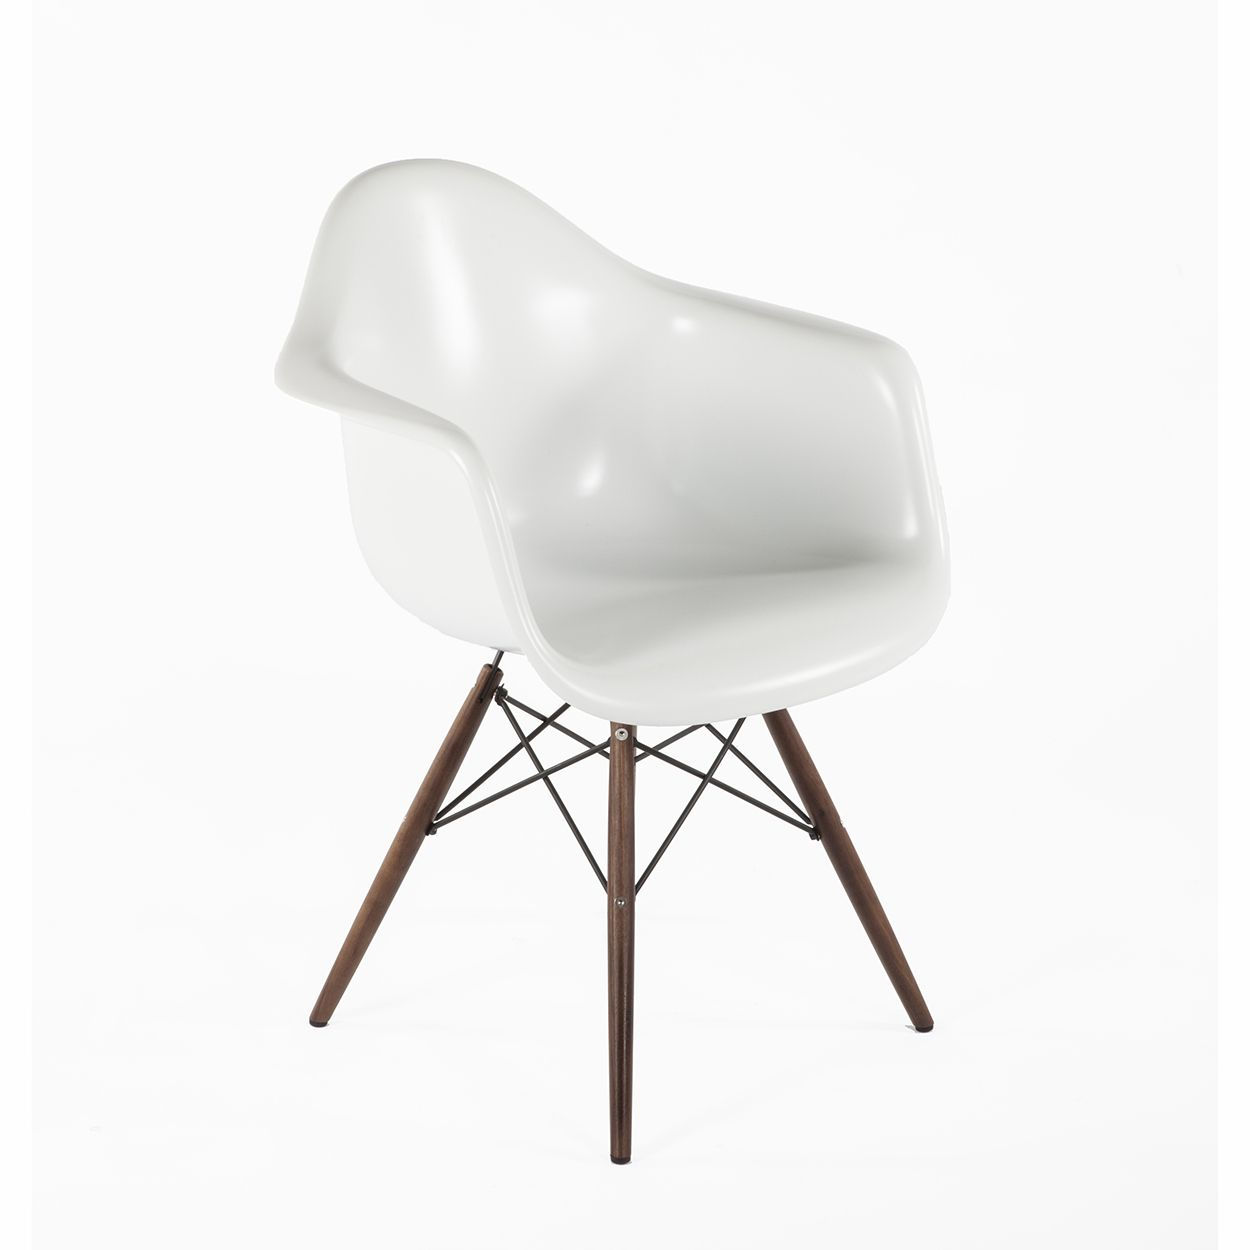 DAW Fiberglass Arm Chair - Matte - White | Have a Seat | Pinterest ...